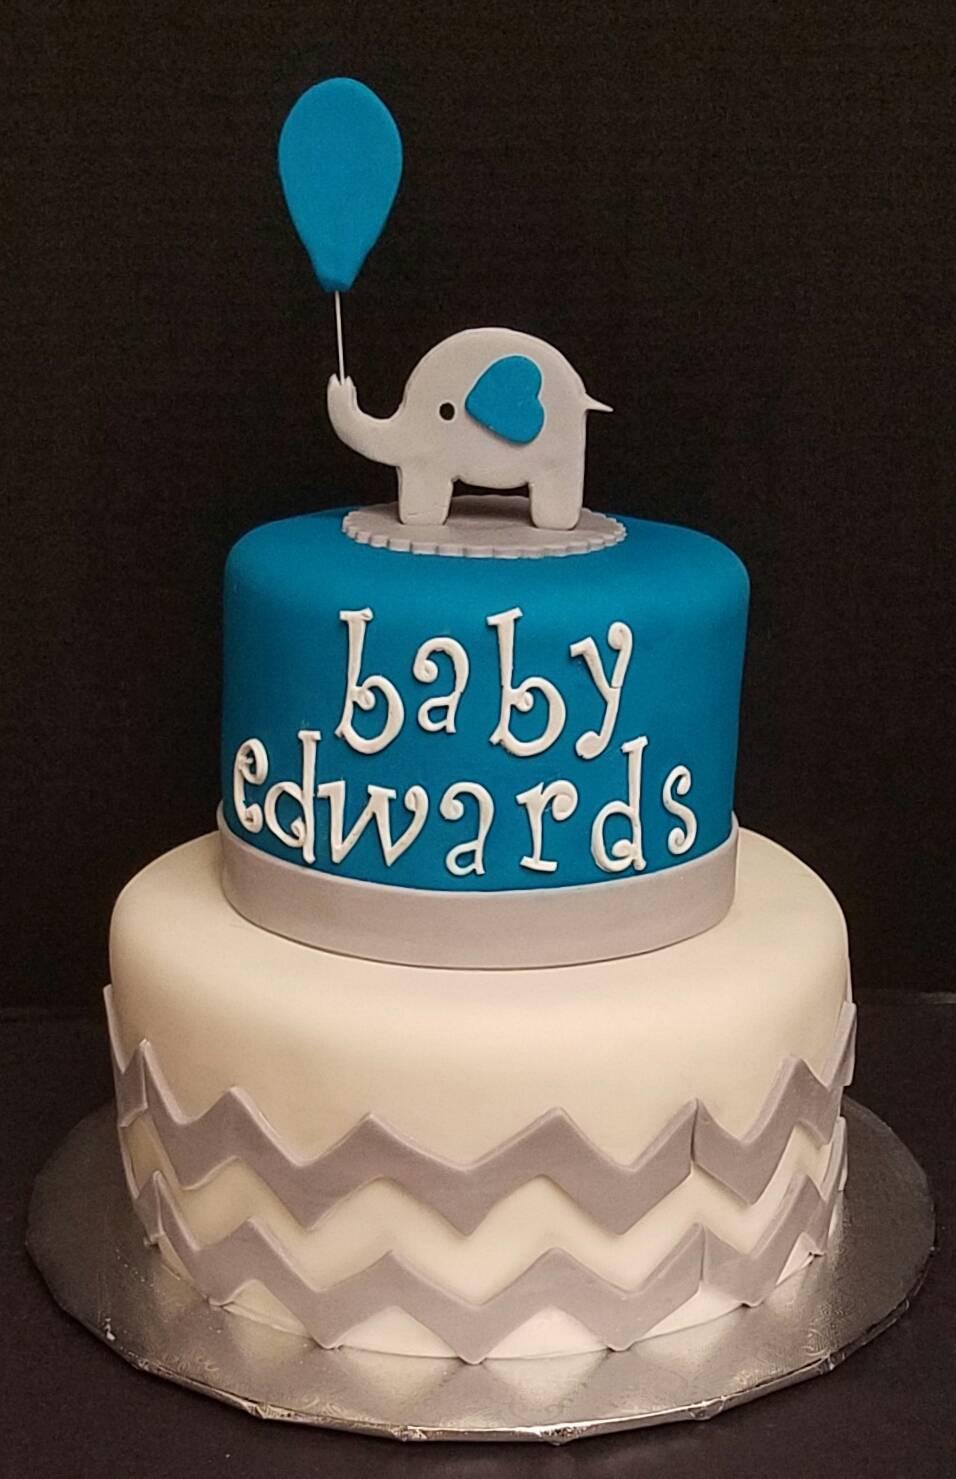 Baby Elephant Boy Chevron Design